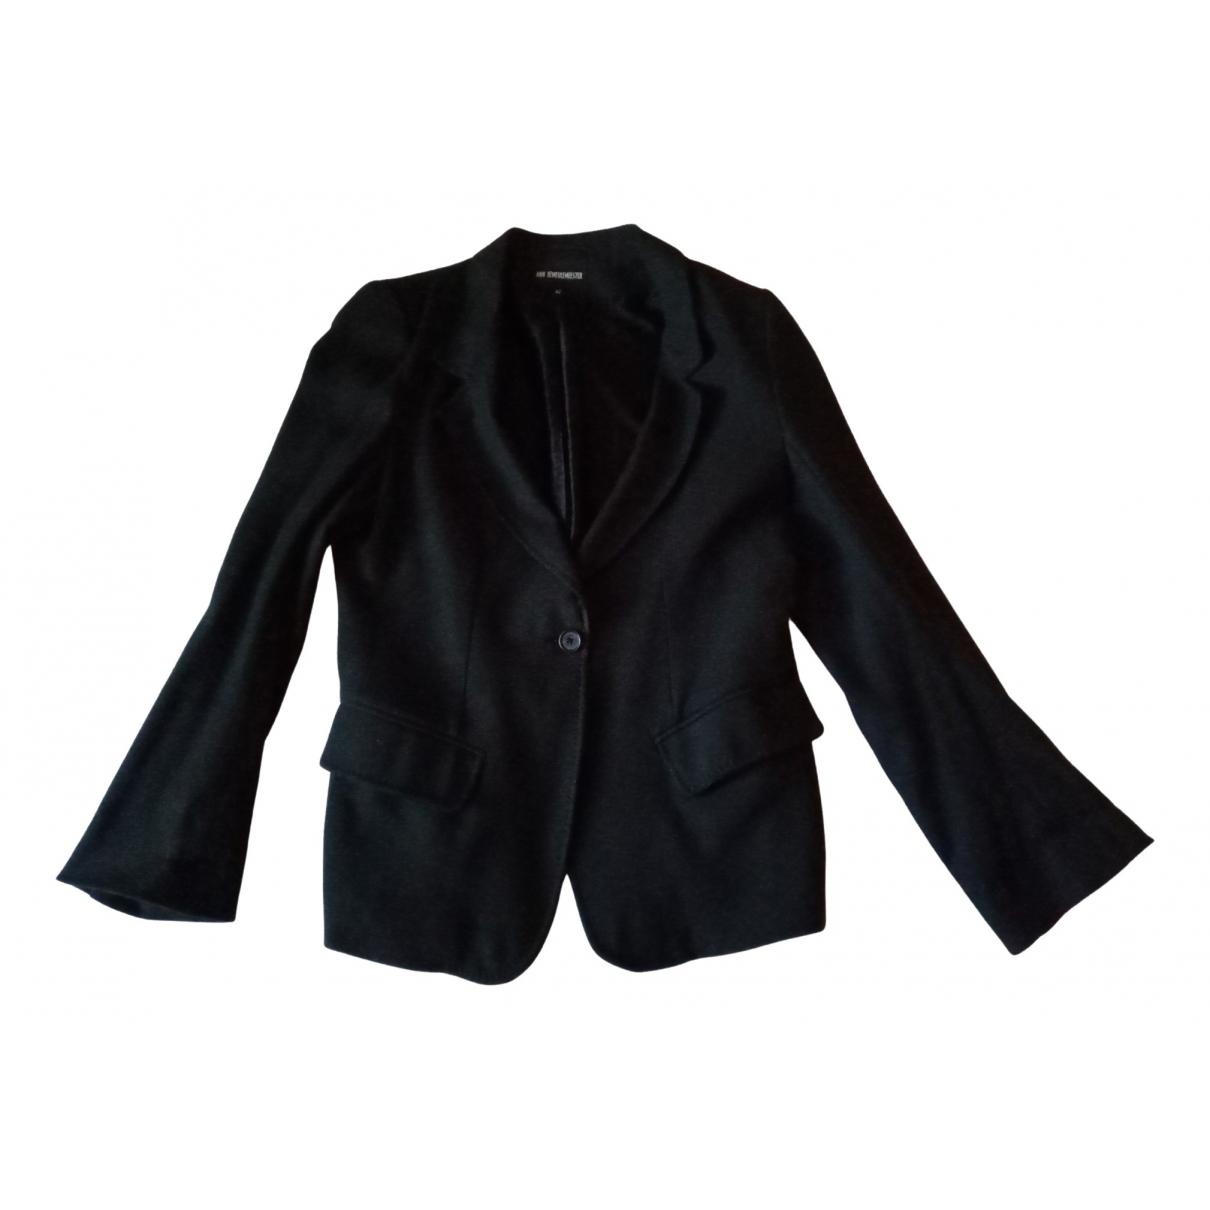 Ann Demeulemeester \N Black Wool jacket for Women 42 FR